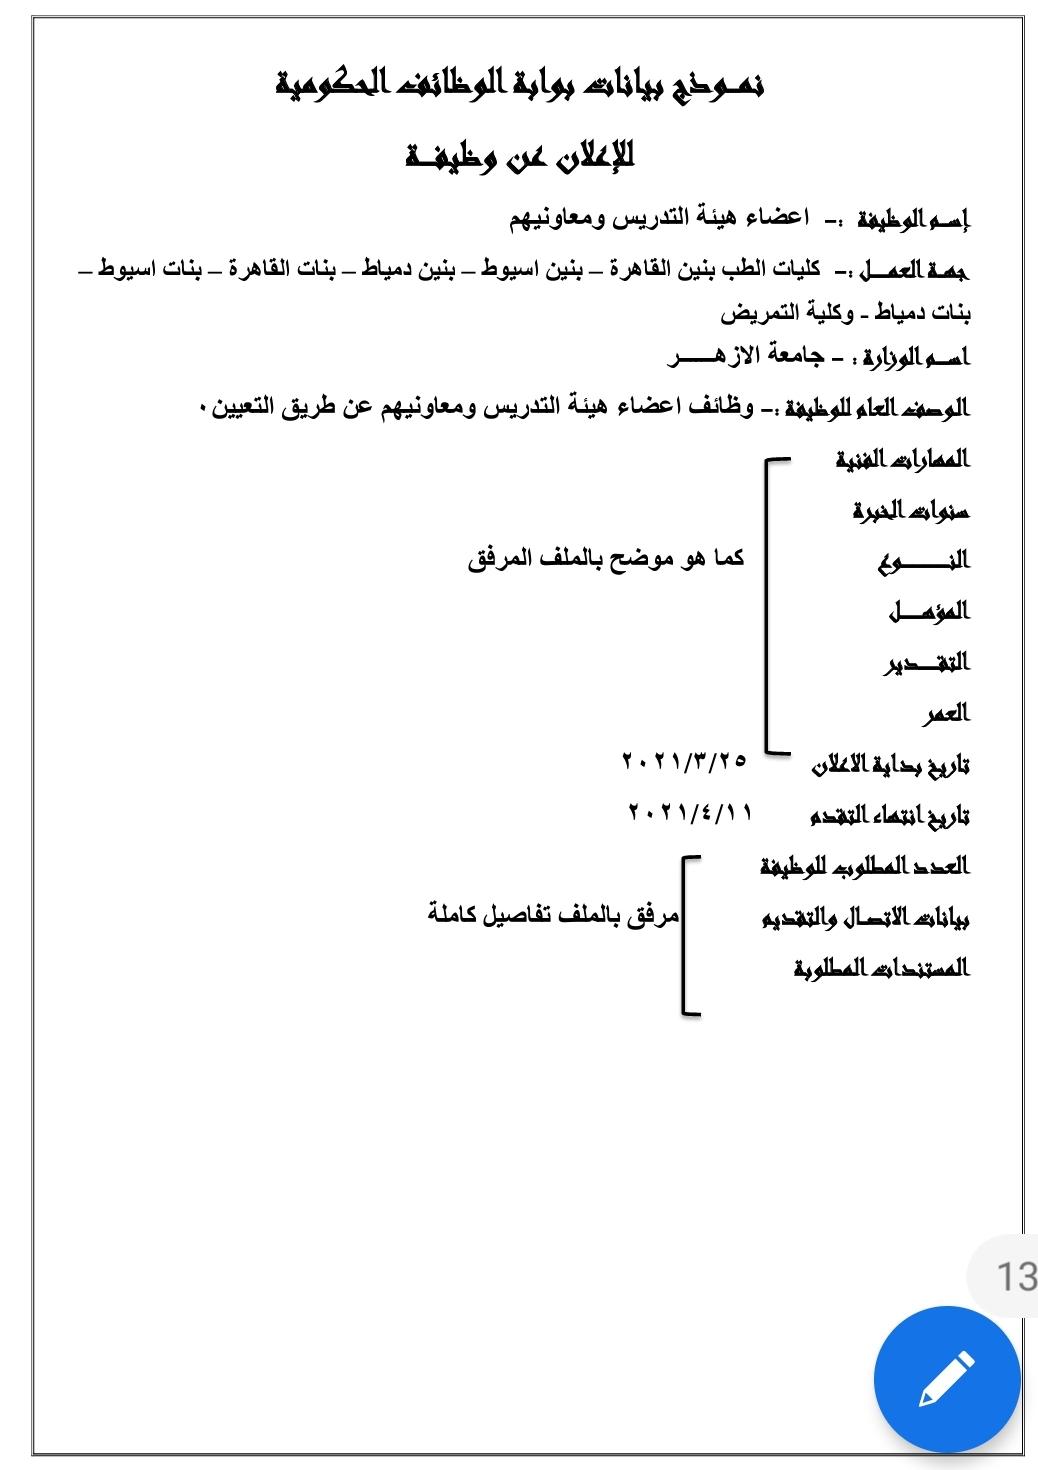 SmartSelect_٢٠٢١٠٣٢٥-١١٠٧٤٩_Acrobat for Samsung (1)